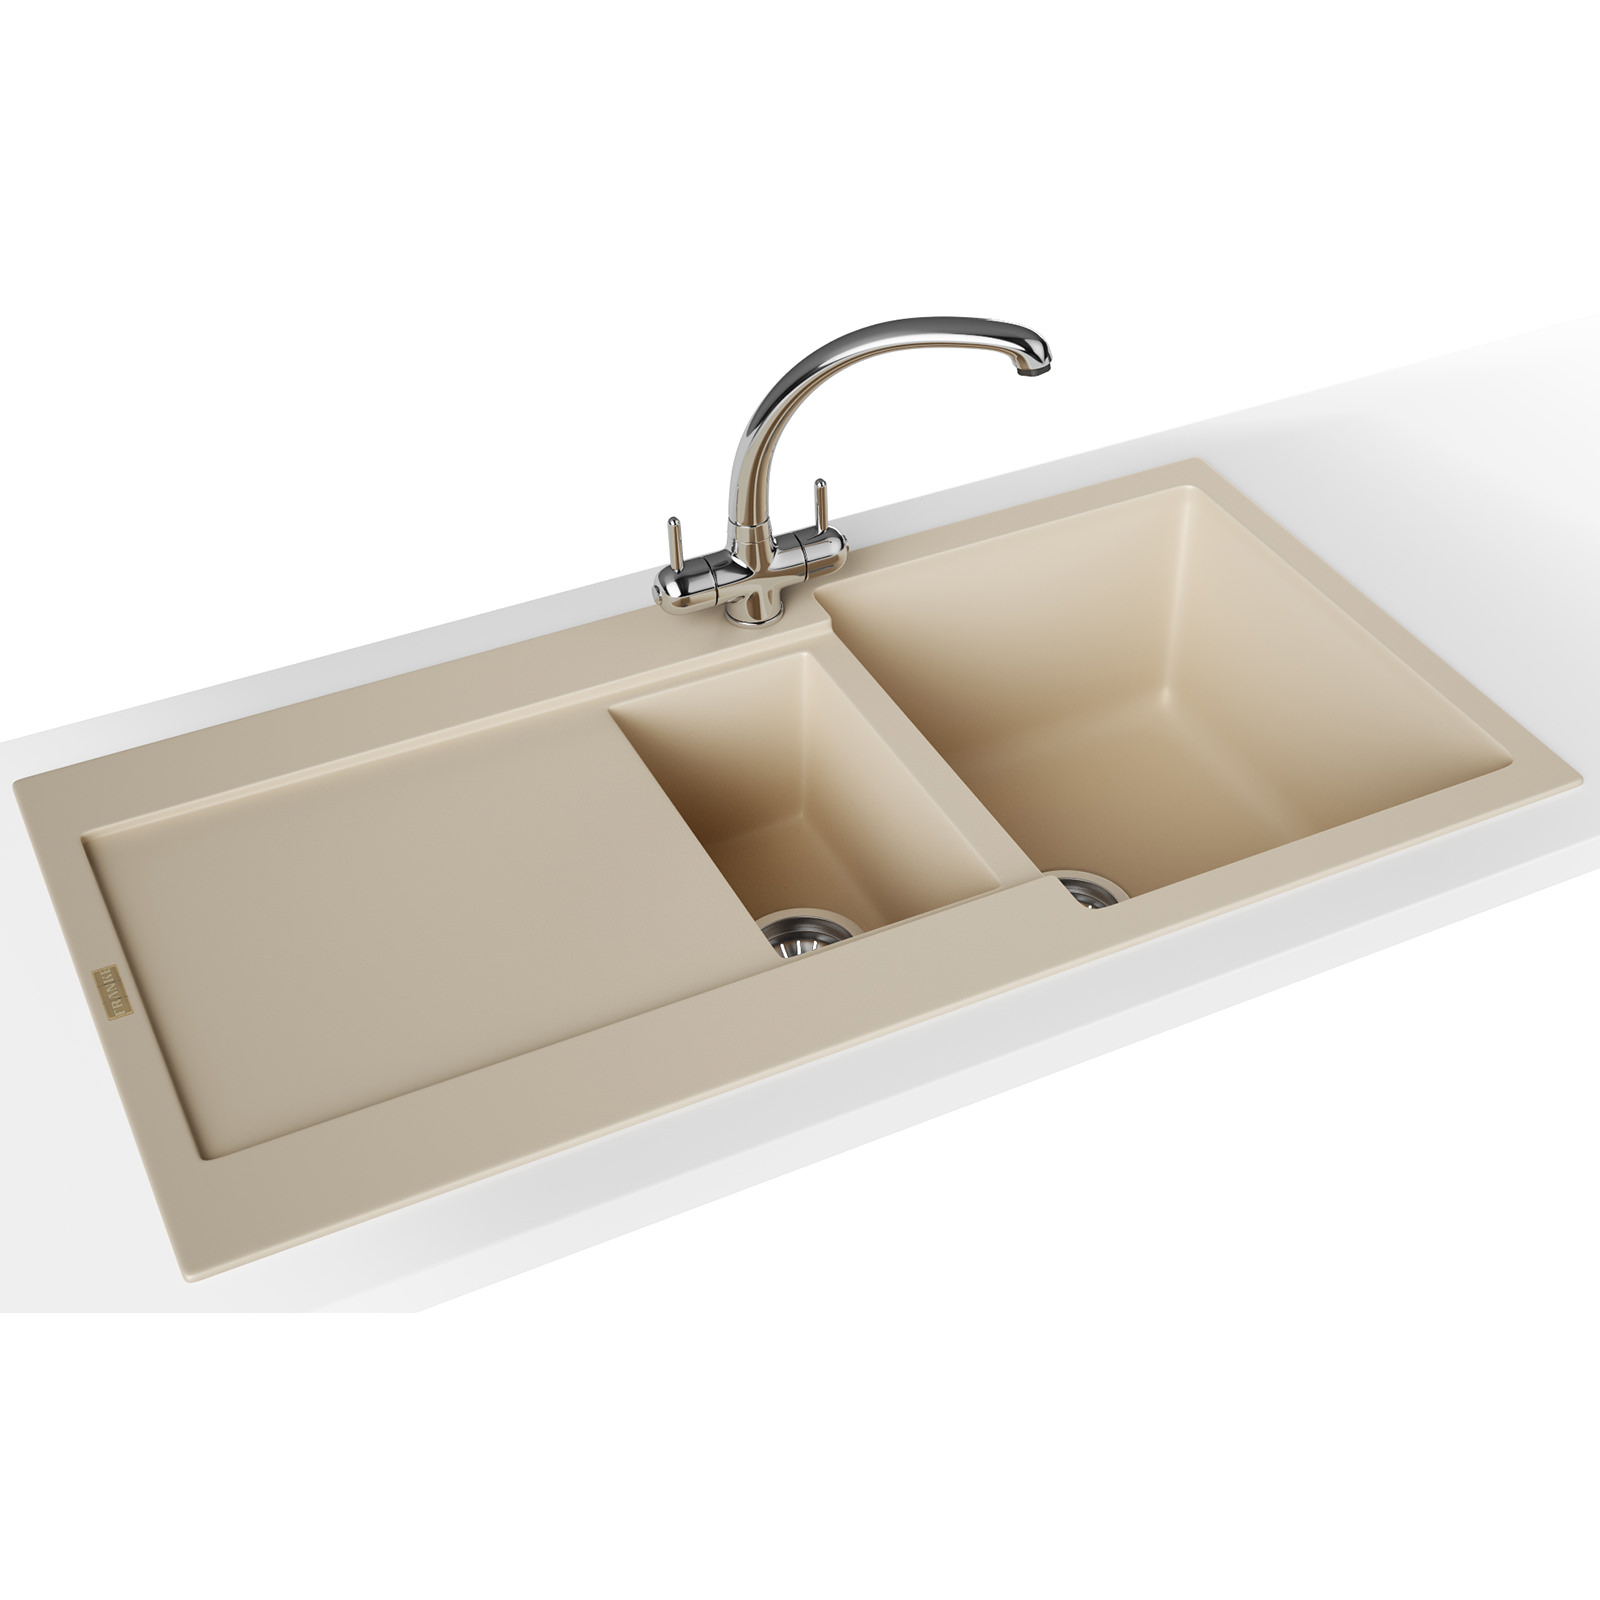 Franke Fragranite Kitchen Sinks - QS Supplies